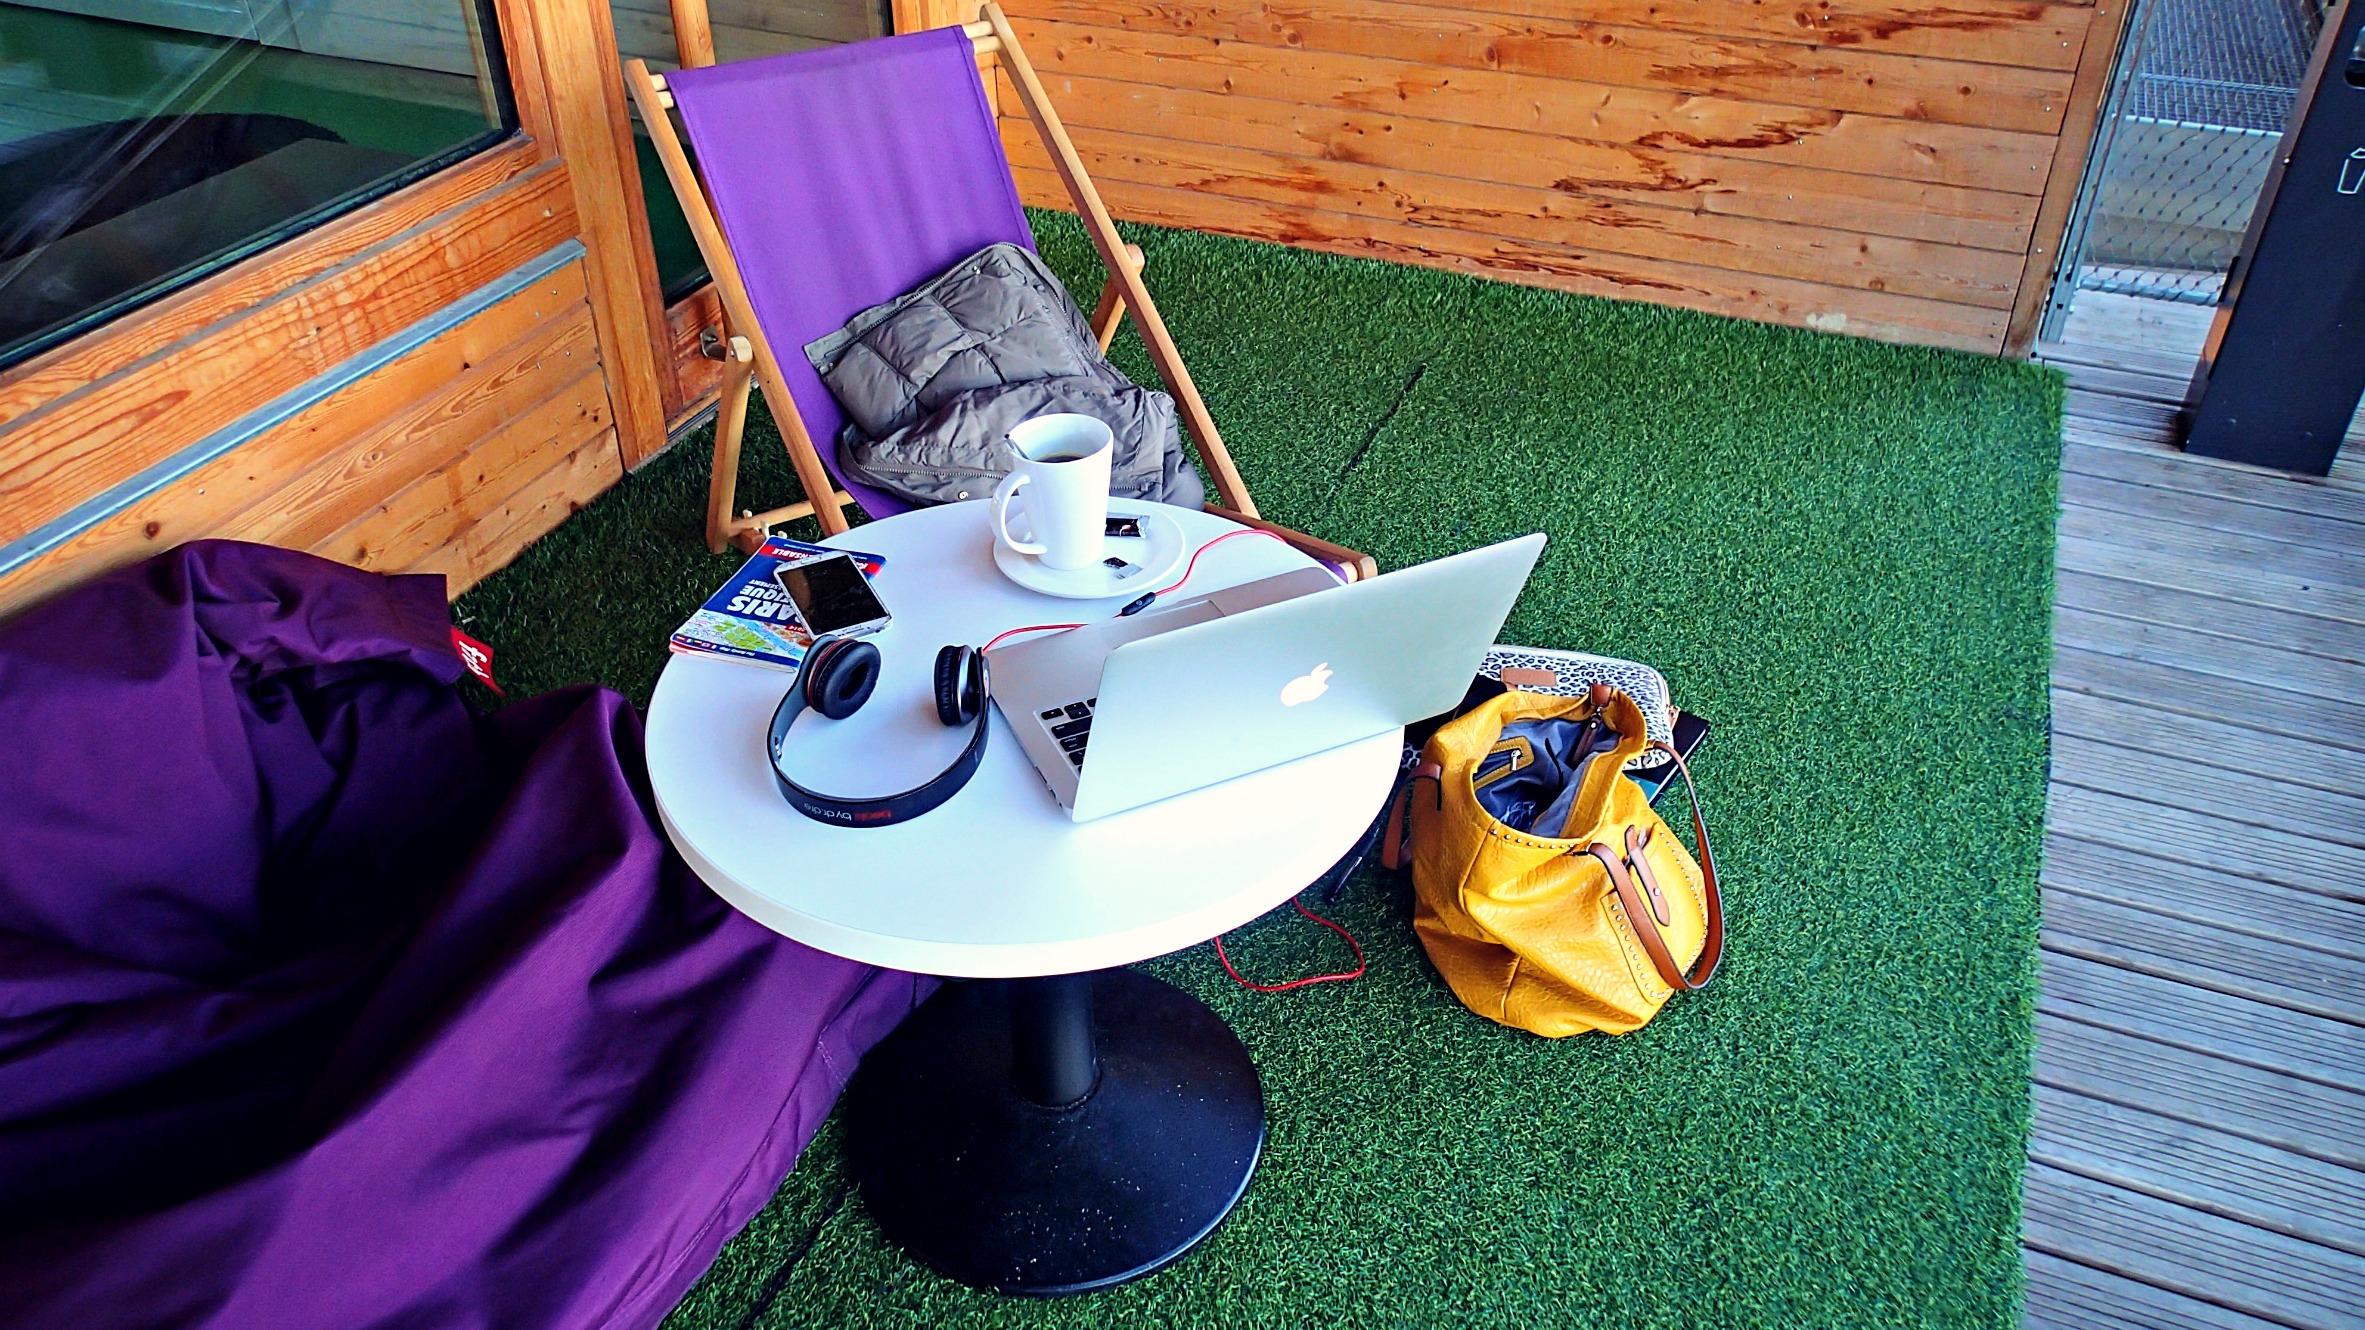 P10101871 Big Blog X: Breakfast at the Hostel!